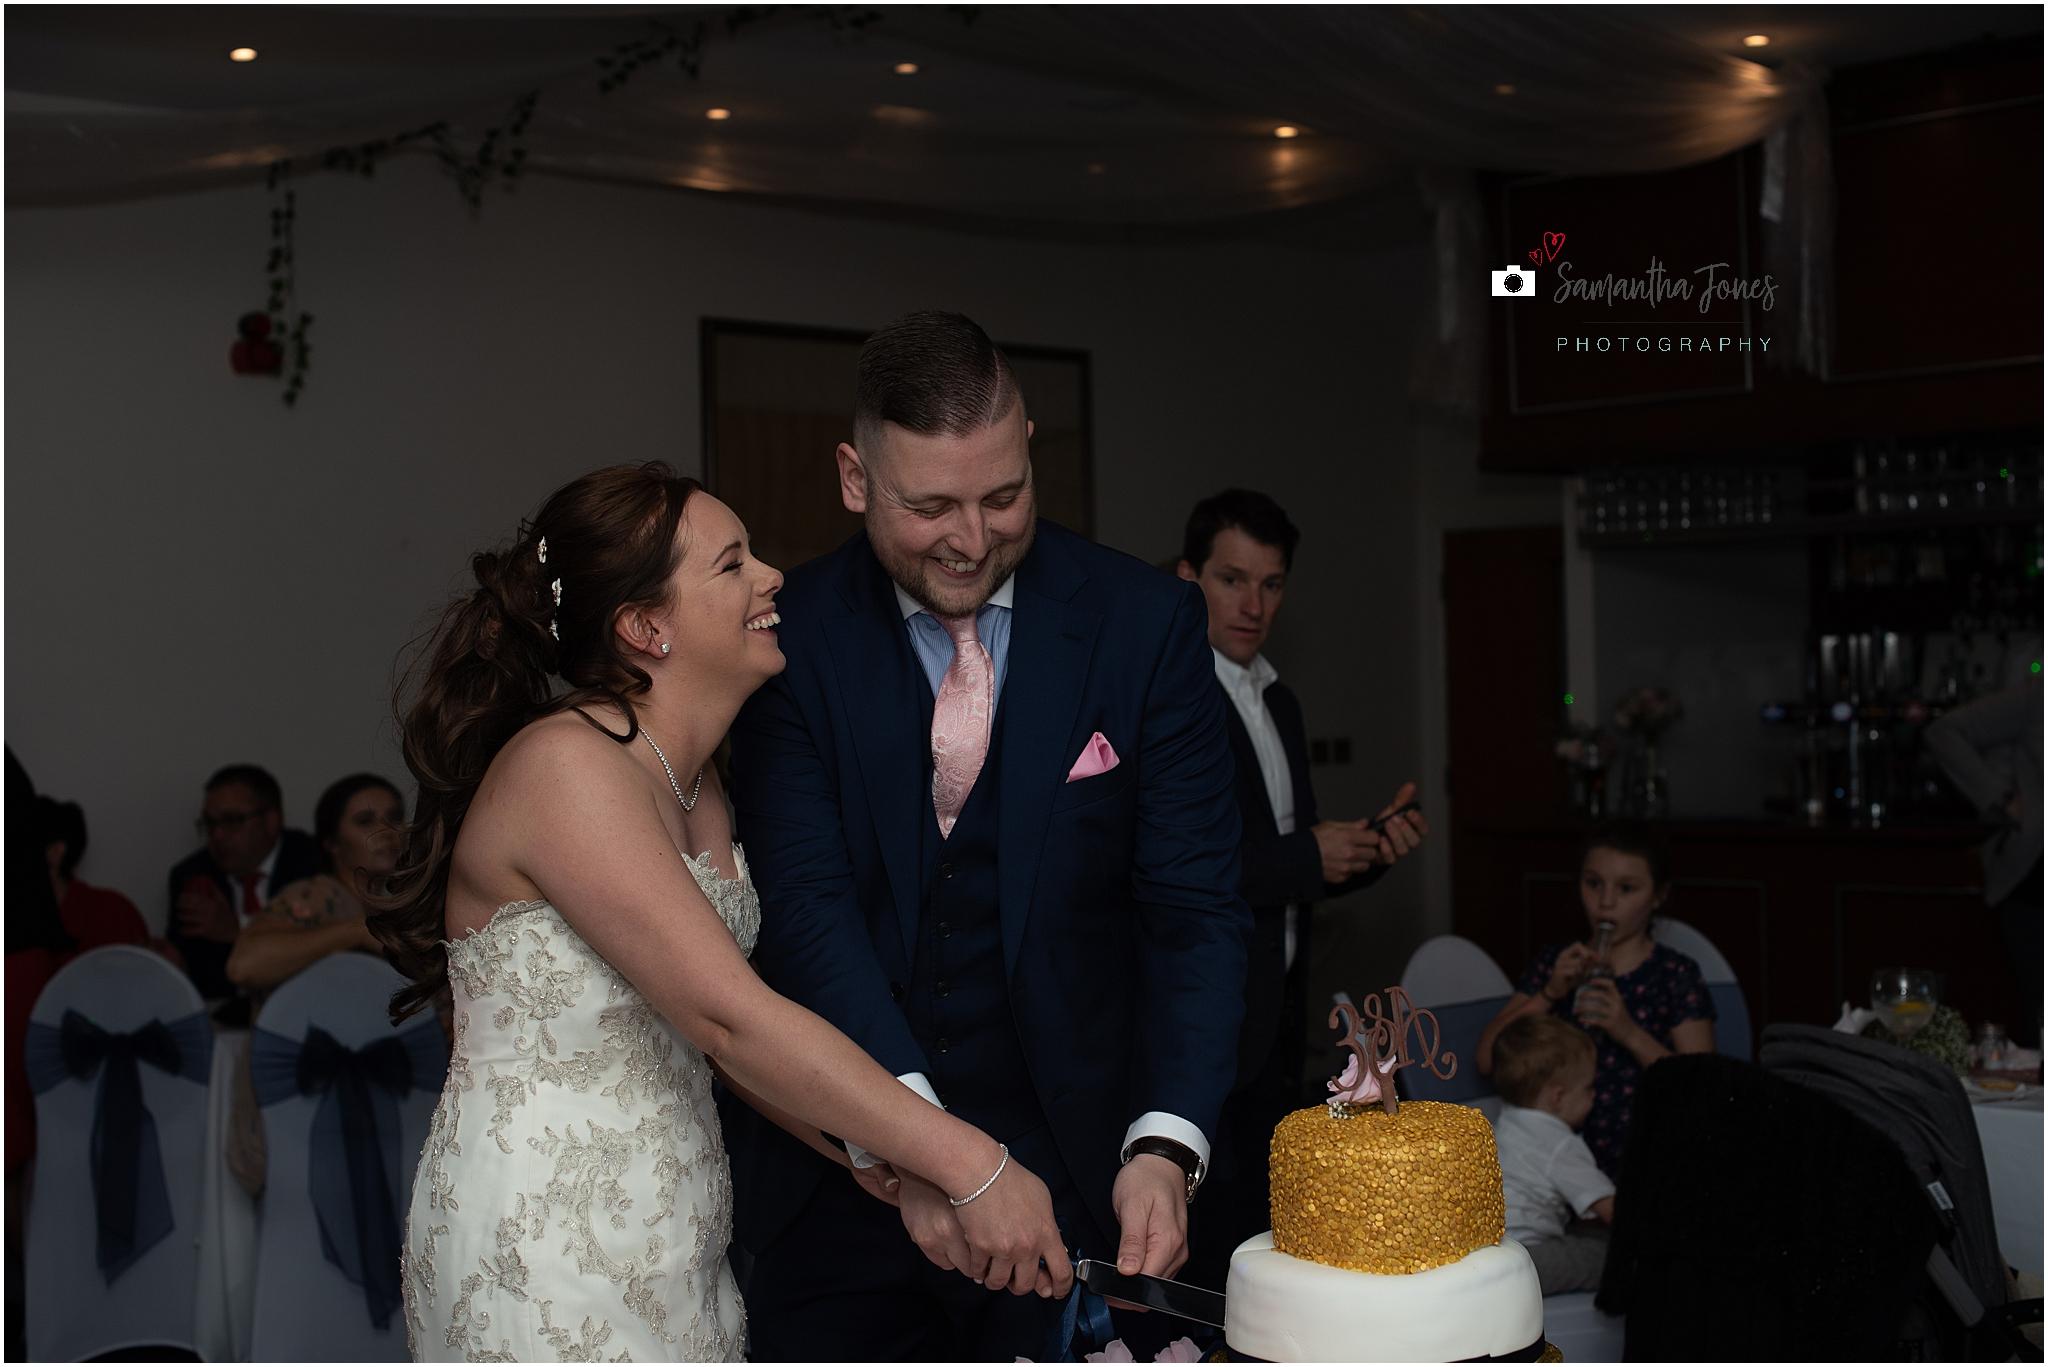 Emma and Aaron twilight wedding at Stonelees cake cutting